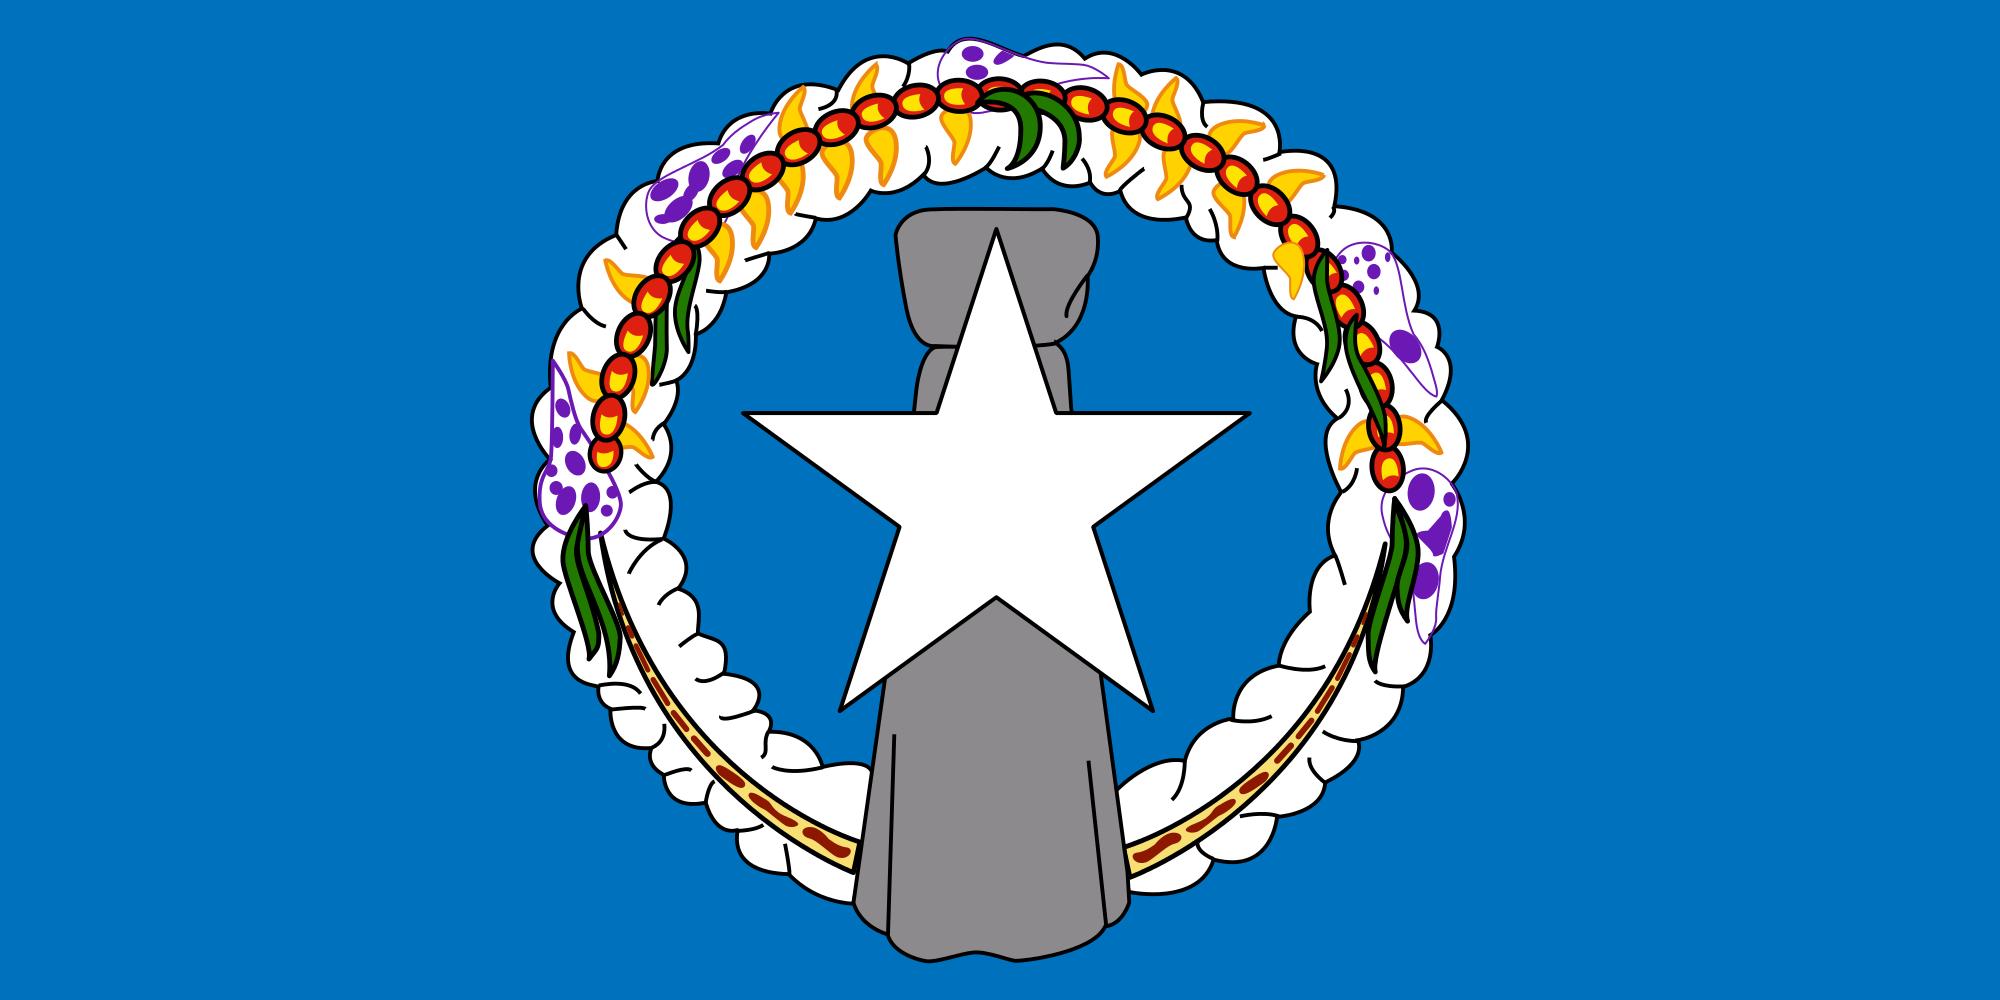 islas marianas del norte, paese, emblema, logo, simbolo - Sfondi HD - Professor-falken.com